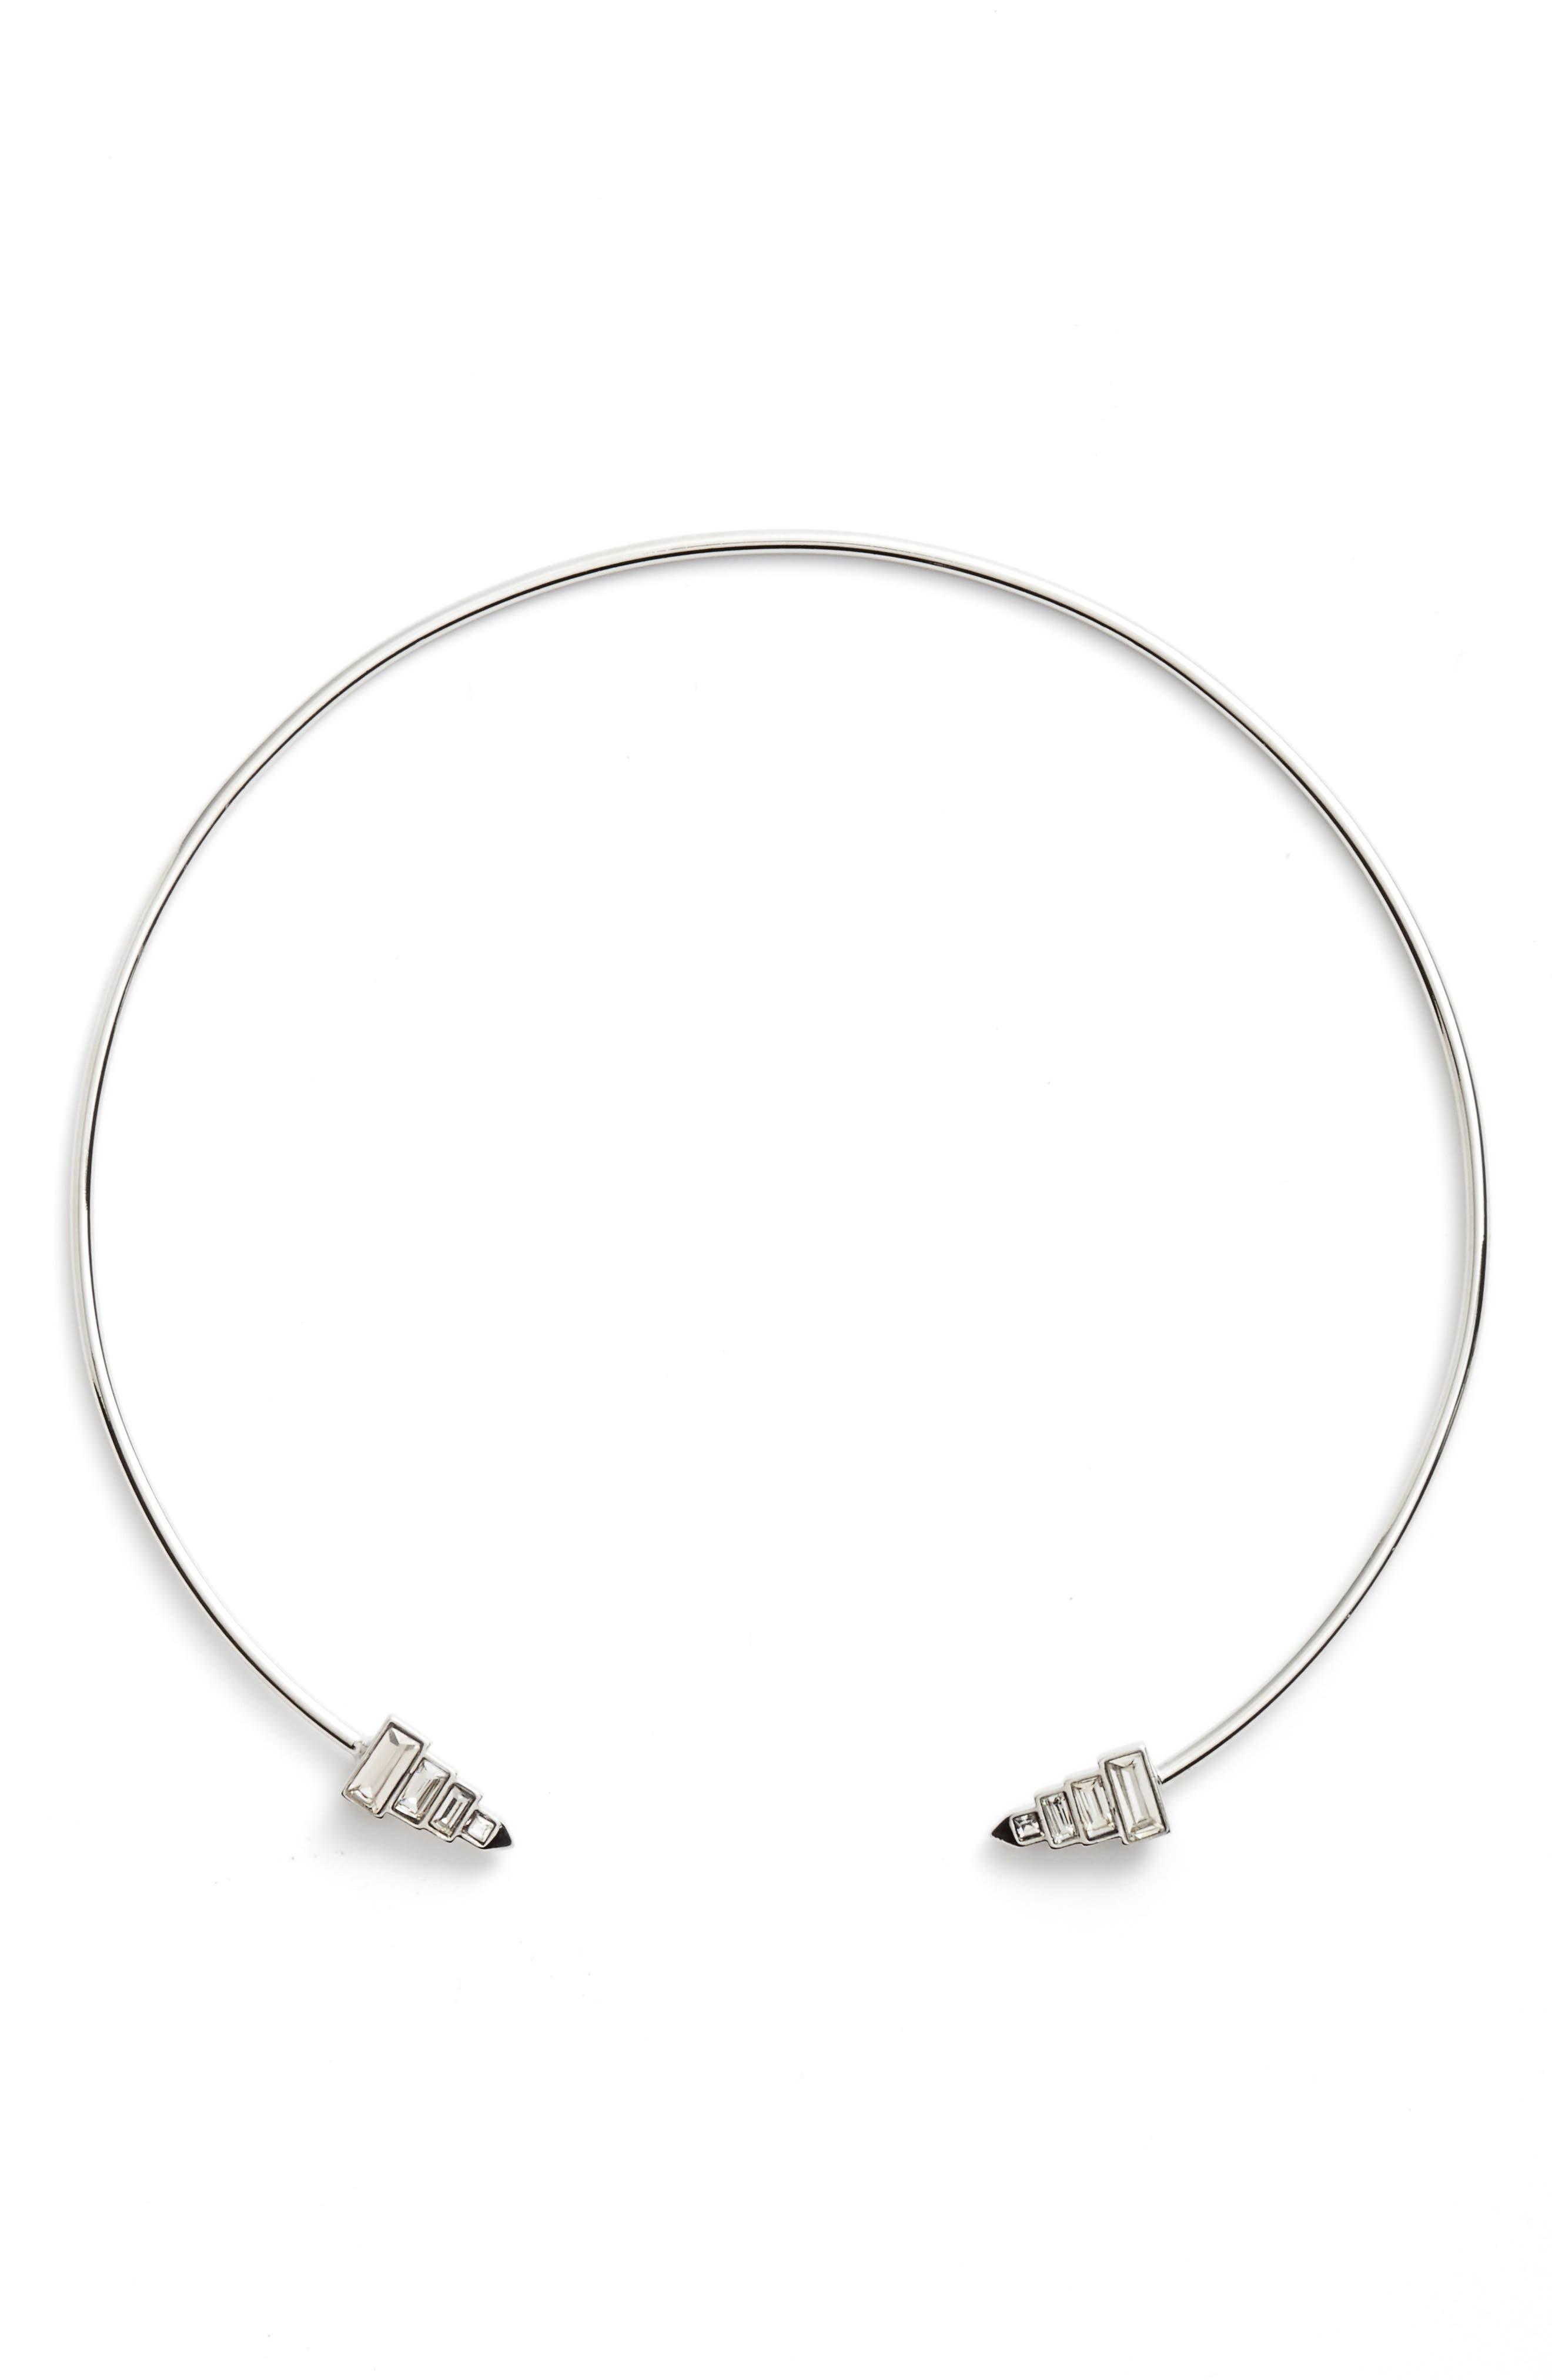 Open Collar Necklace,                             Main thumbnail 1, color,                             040